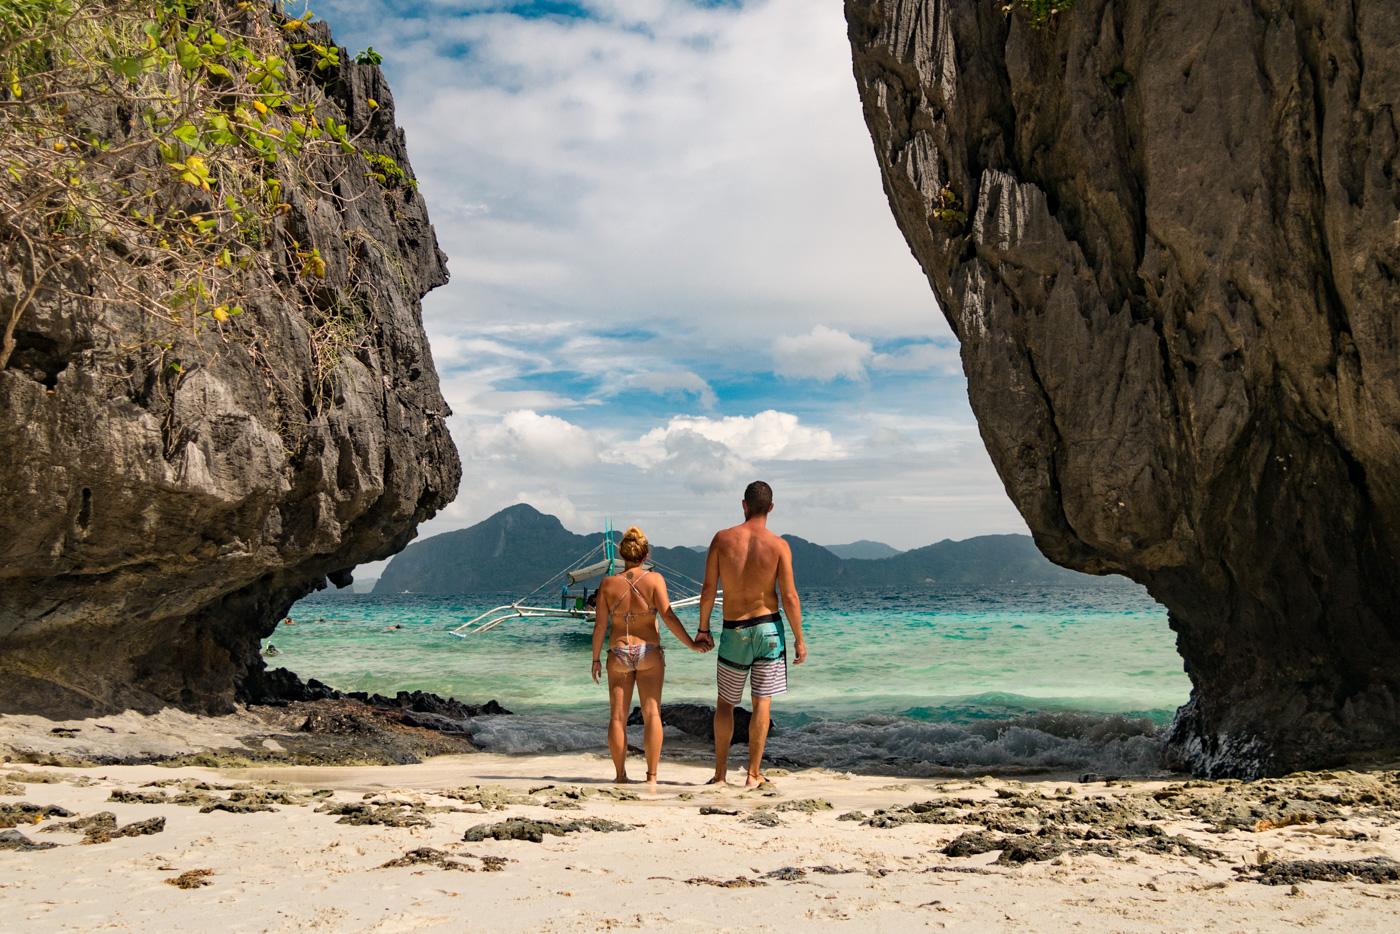 Islandhopping Tour B - El Nido, Palawan - Philippinen